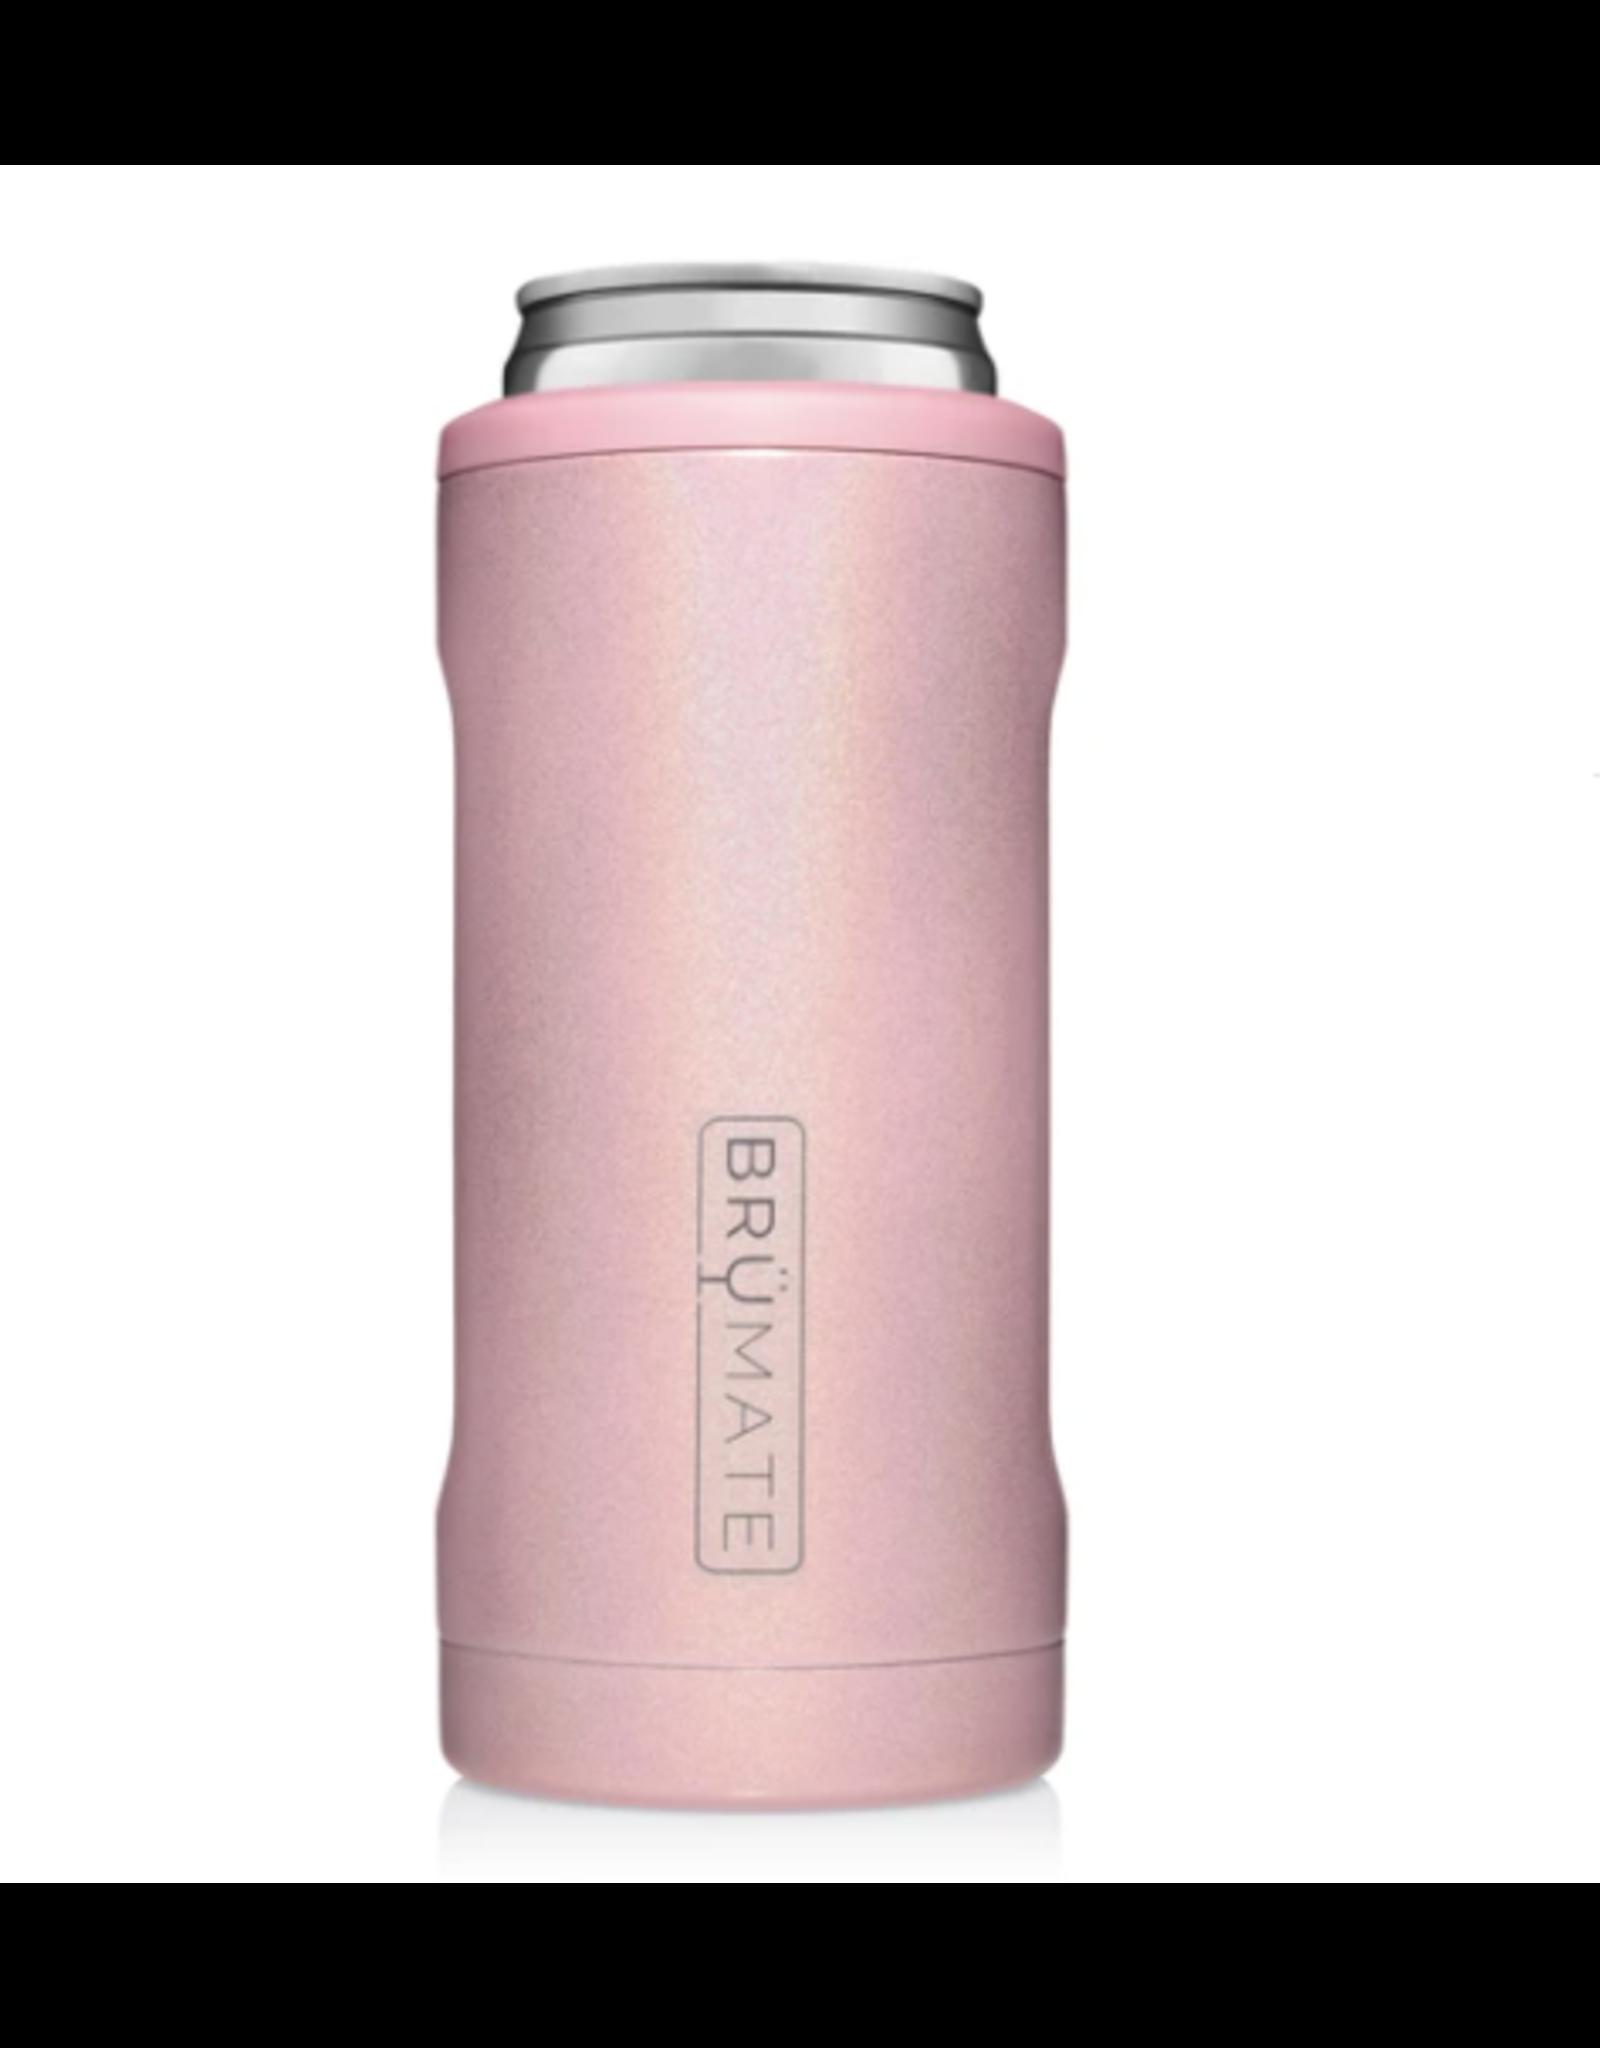 Hopsulator Slim Insulated Can-Cooler, glitter blush